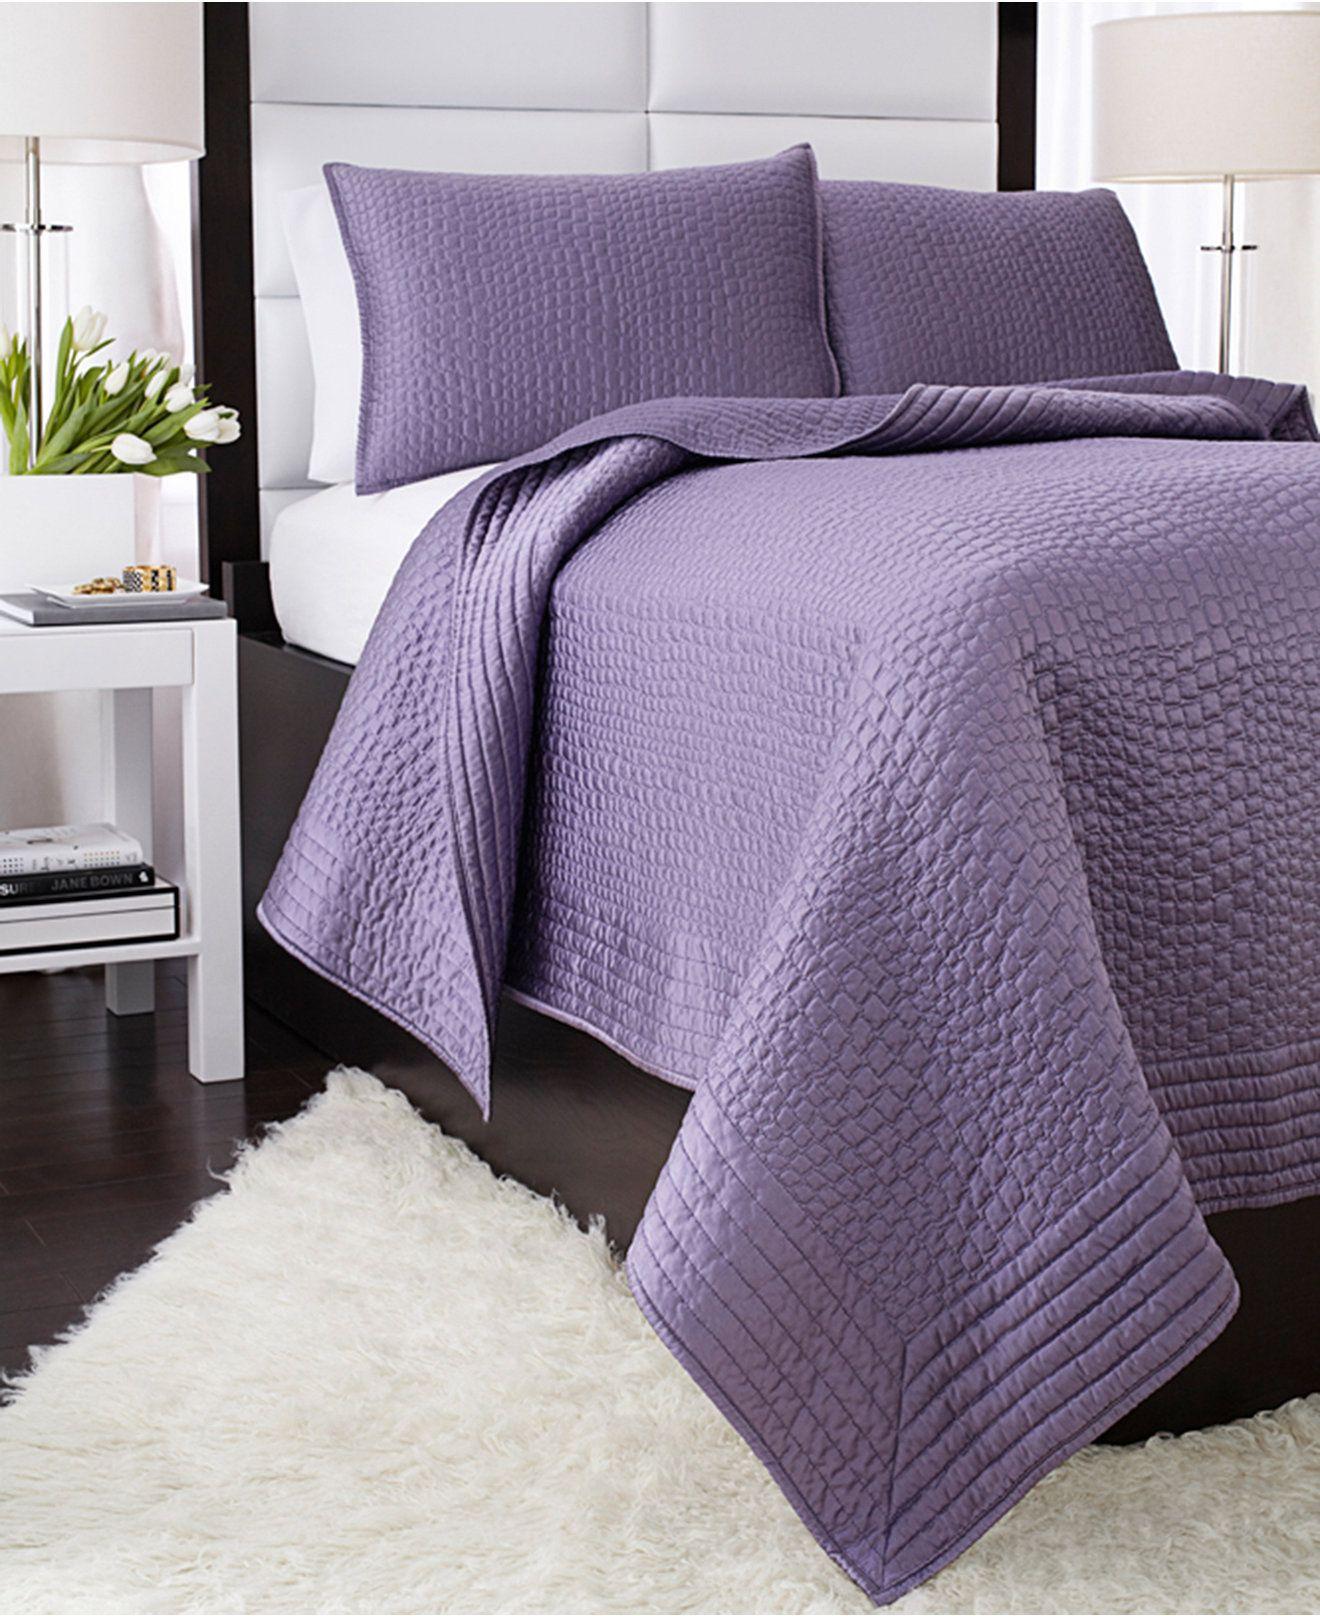 blush lyon stores cf vince sets set comforters comforter stage p hg b zm camuto